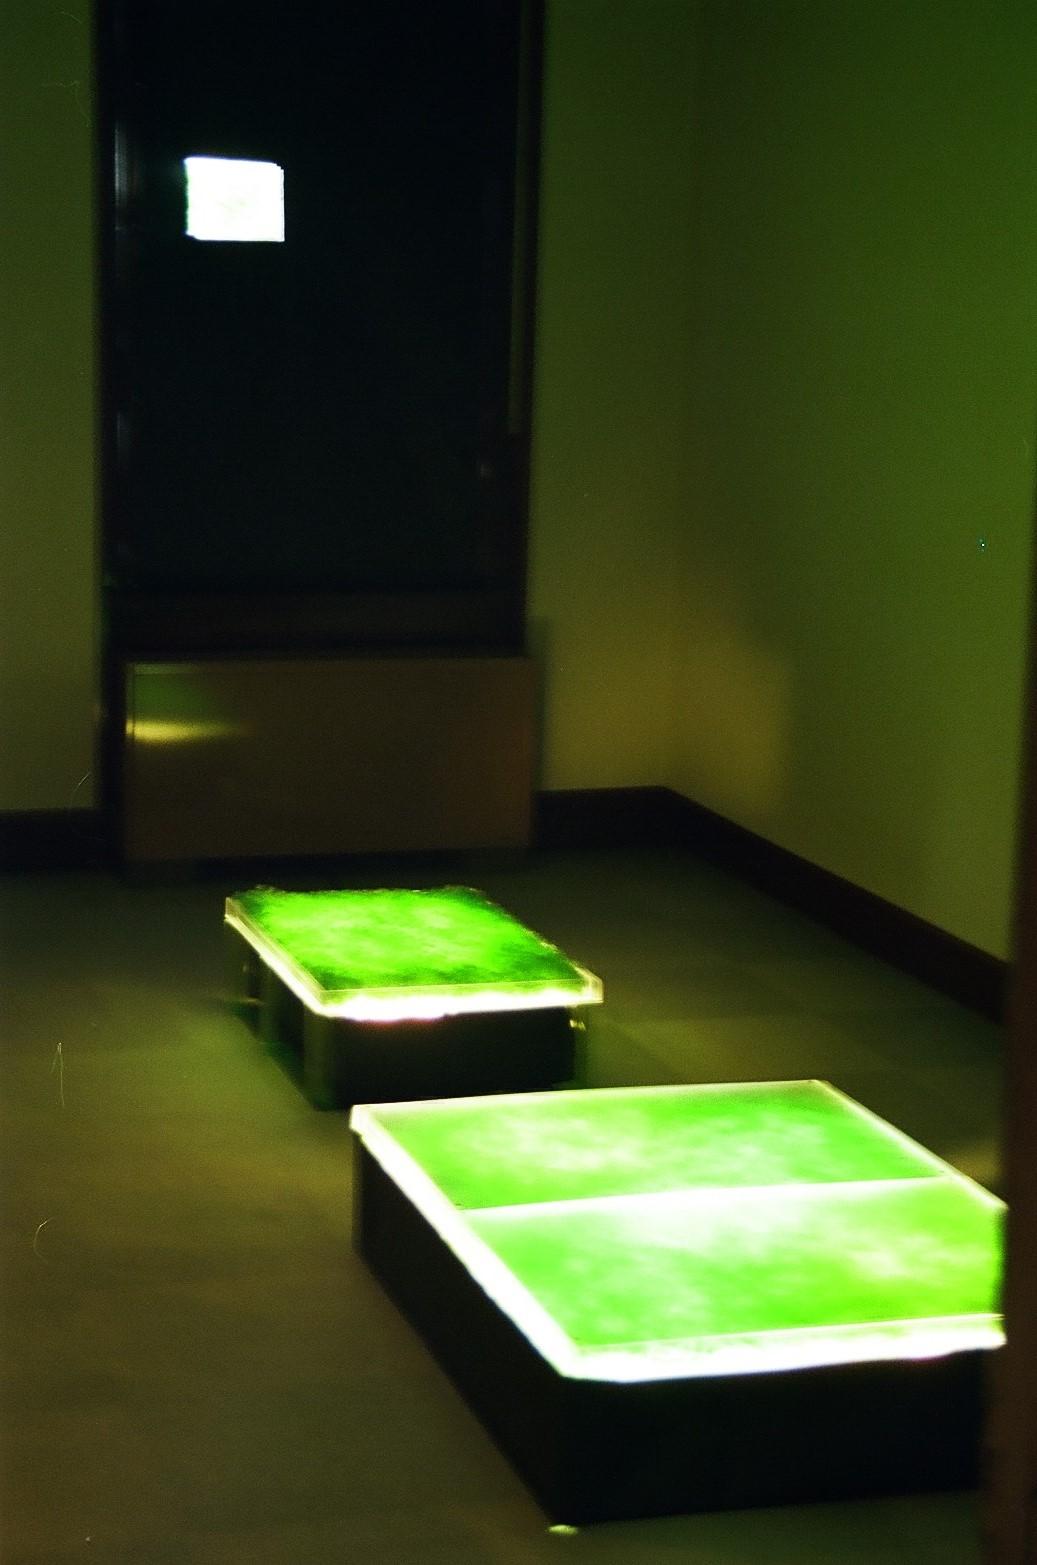 Tamura Yoko's Exihibition-Untitled-Sapporo museum mini gallery in 1999